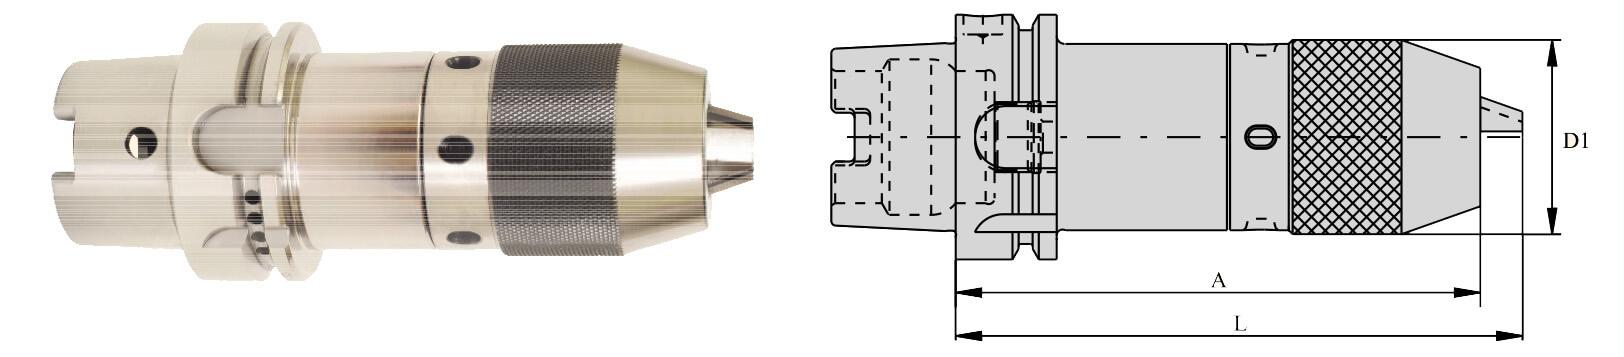 HSK100 Integral Drill Chuck (NCDC)